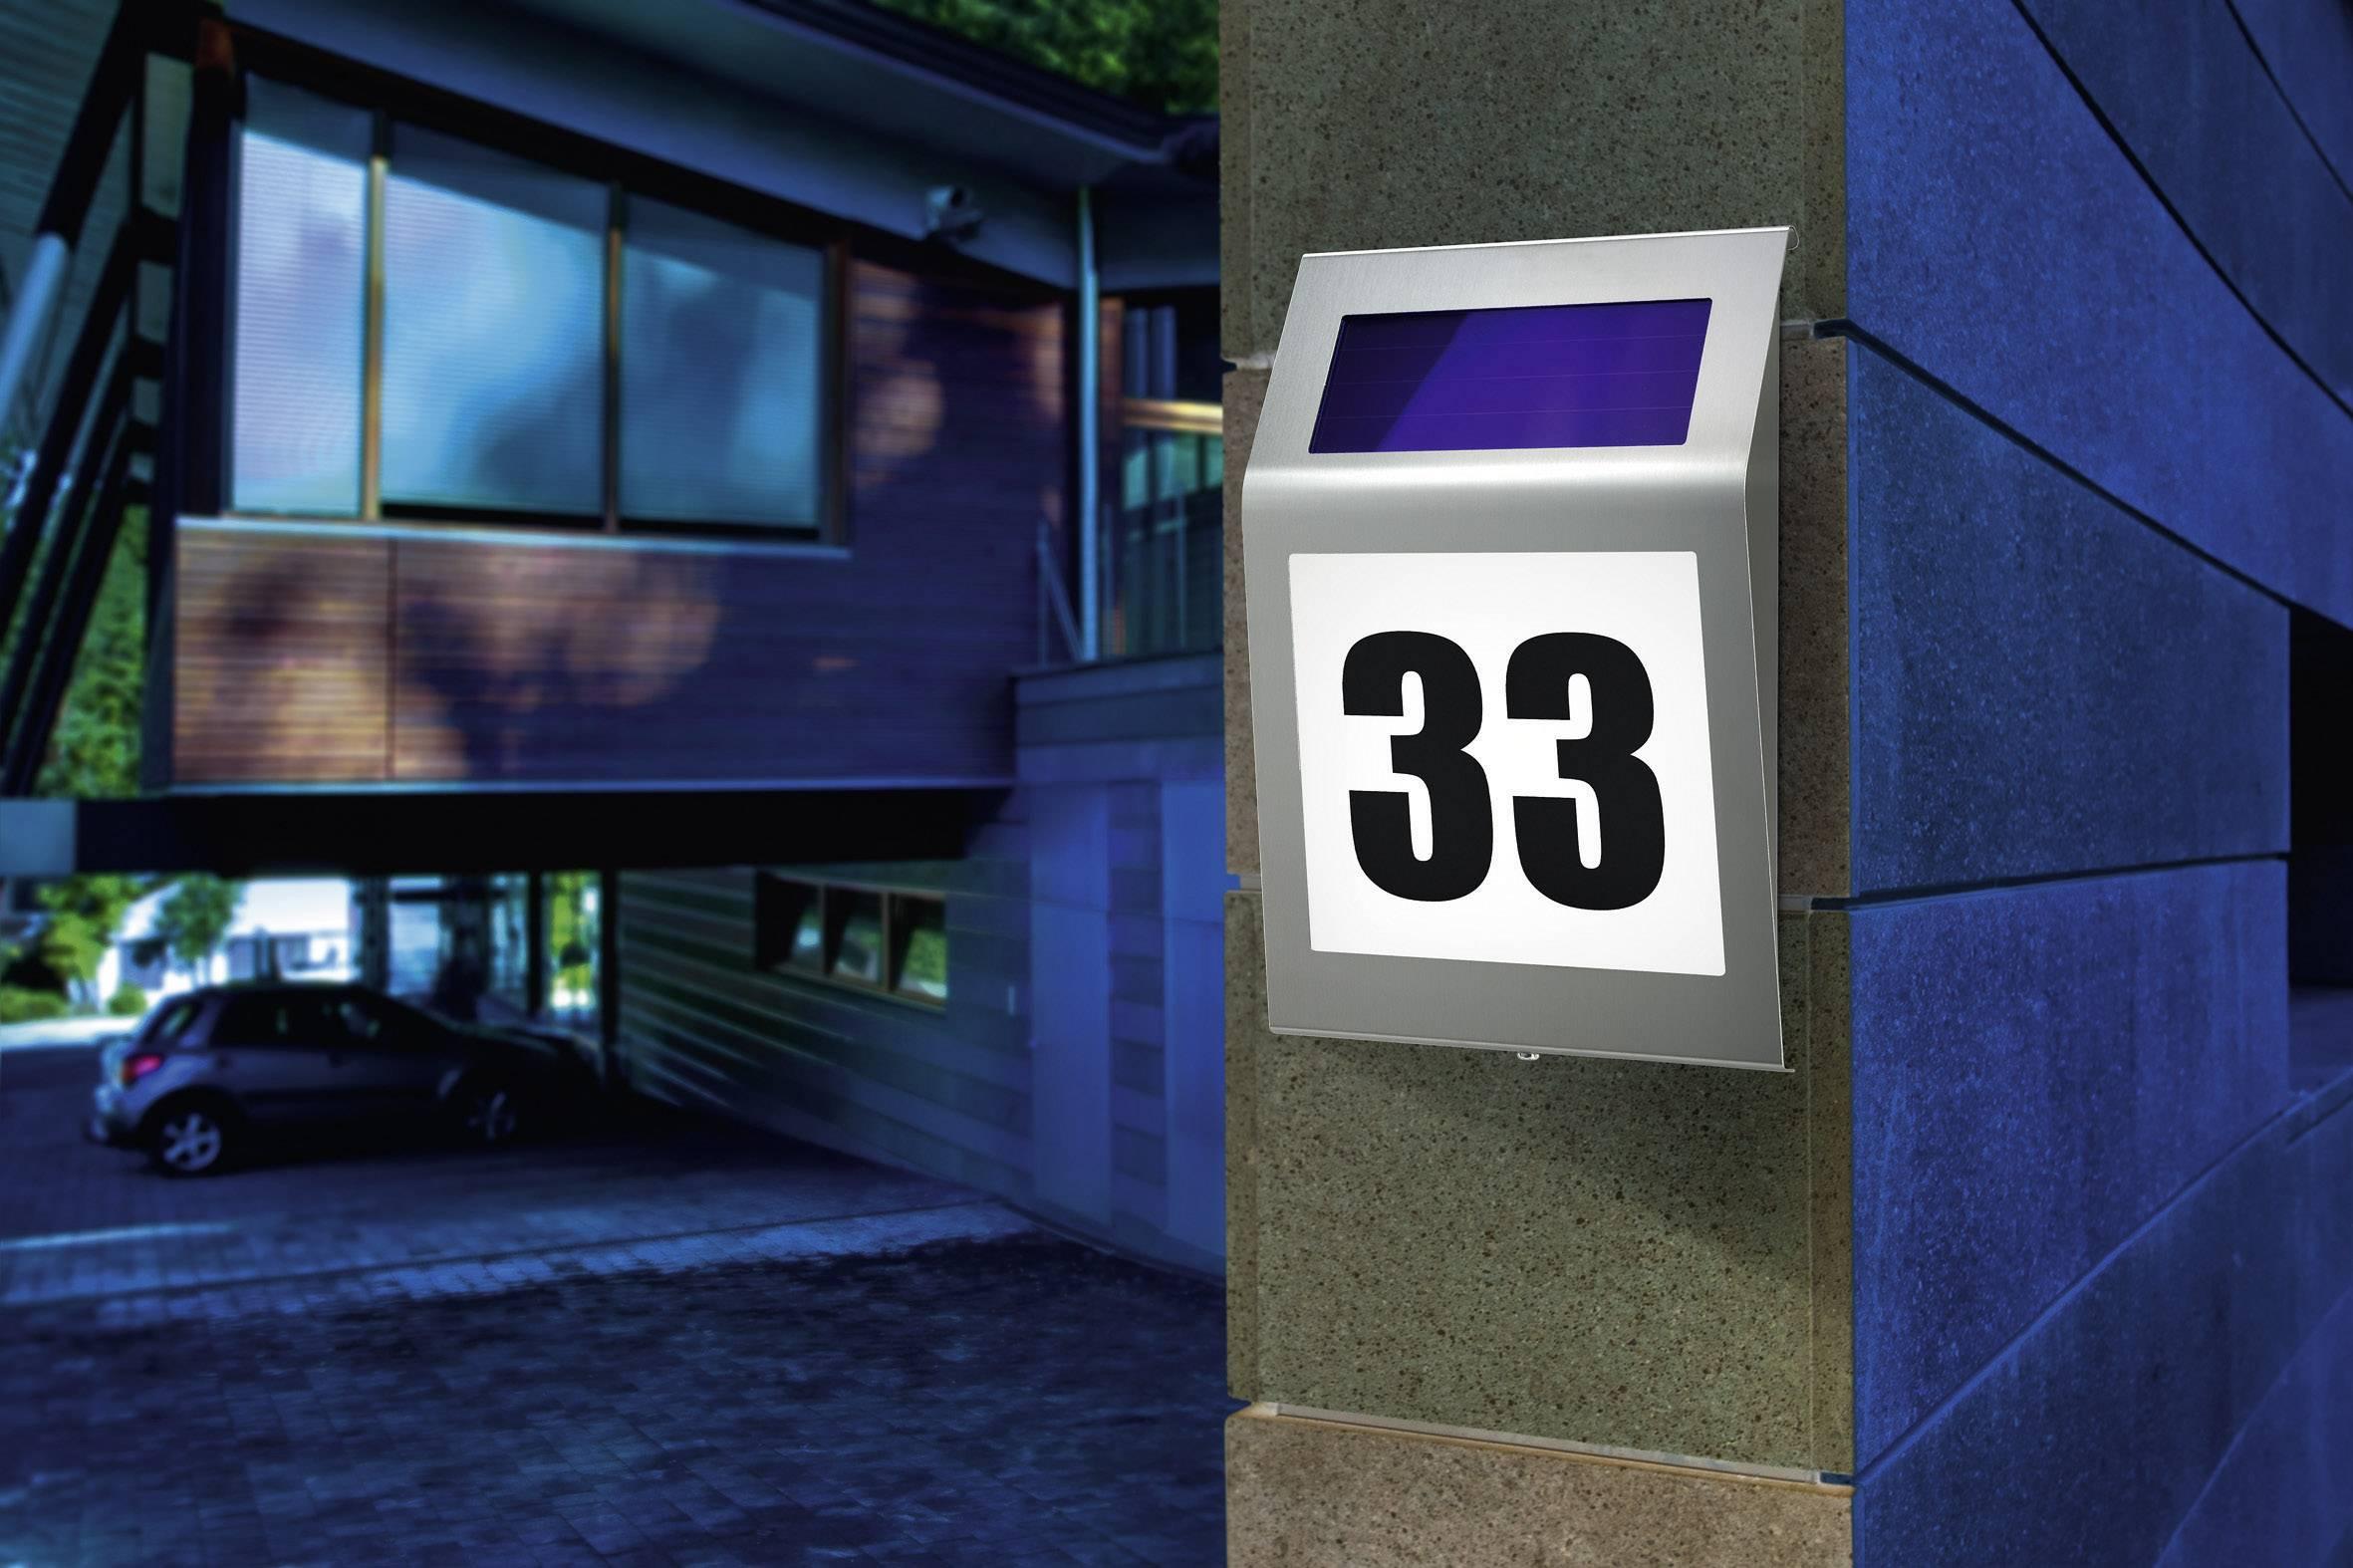 Solárne nerezové LED osvetlenie domového čísla Esotec Style